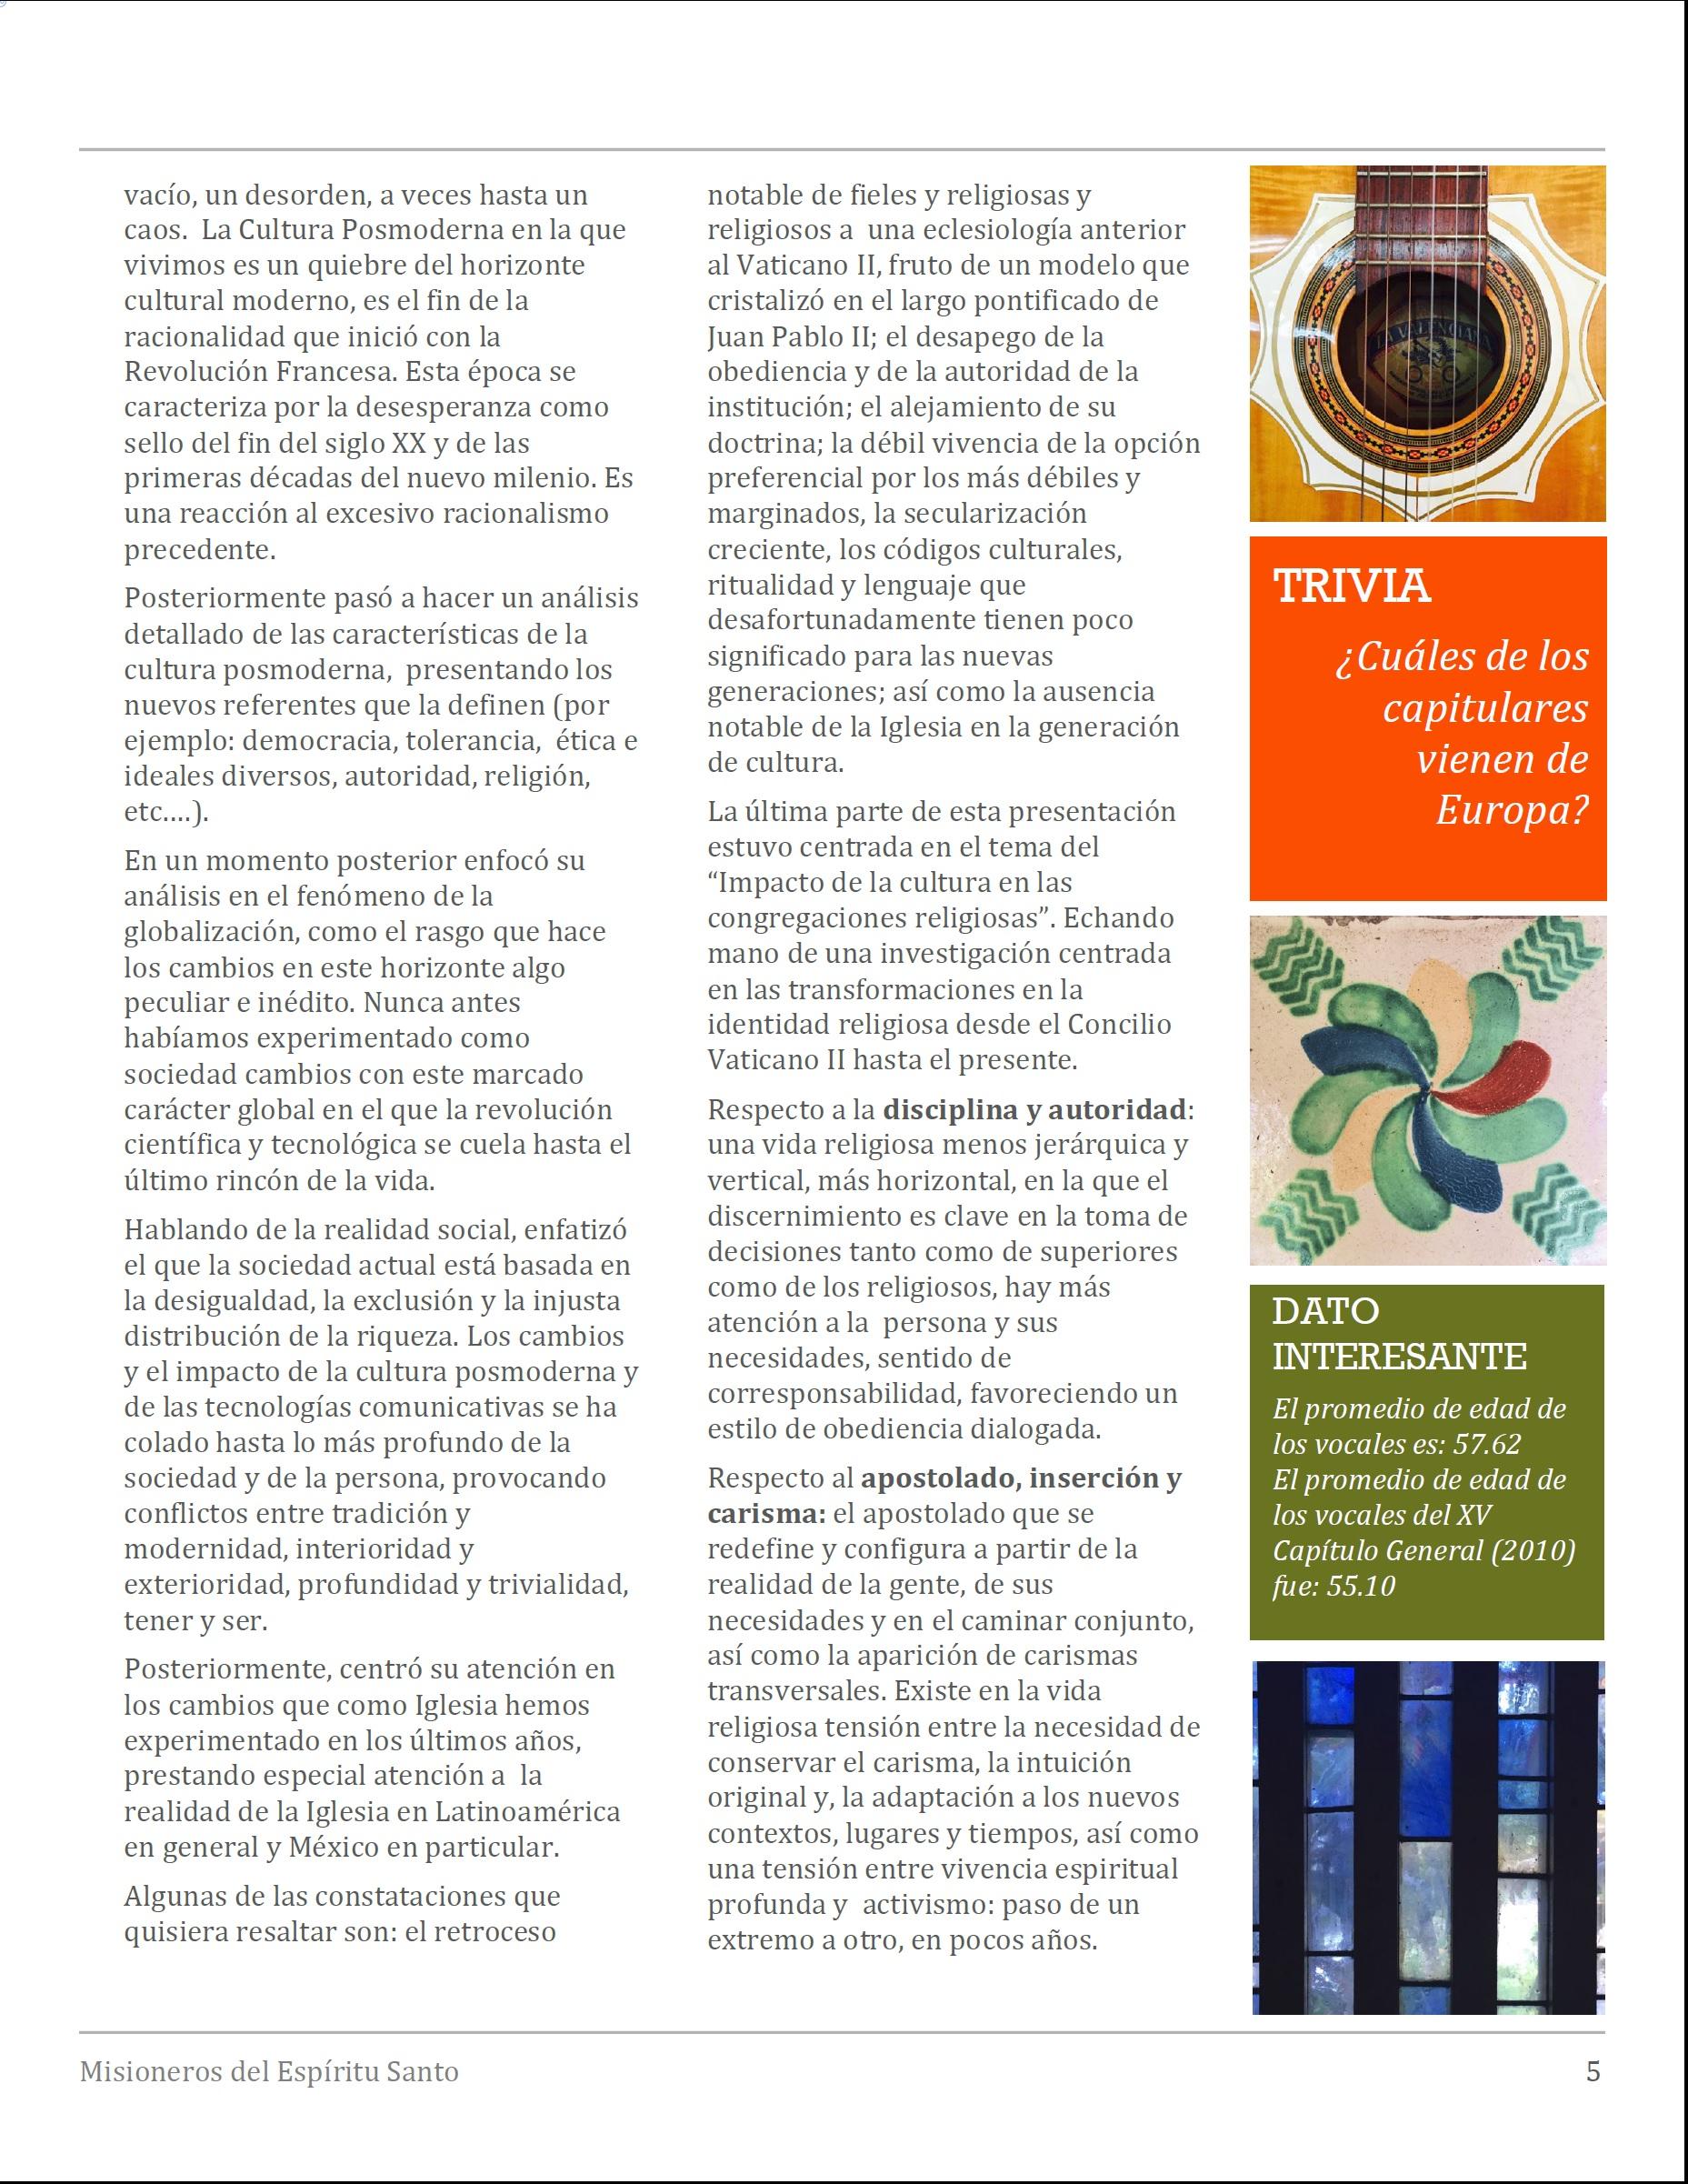 Crónica2 p5